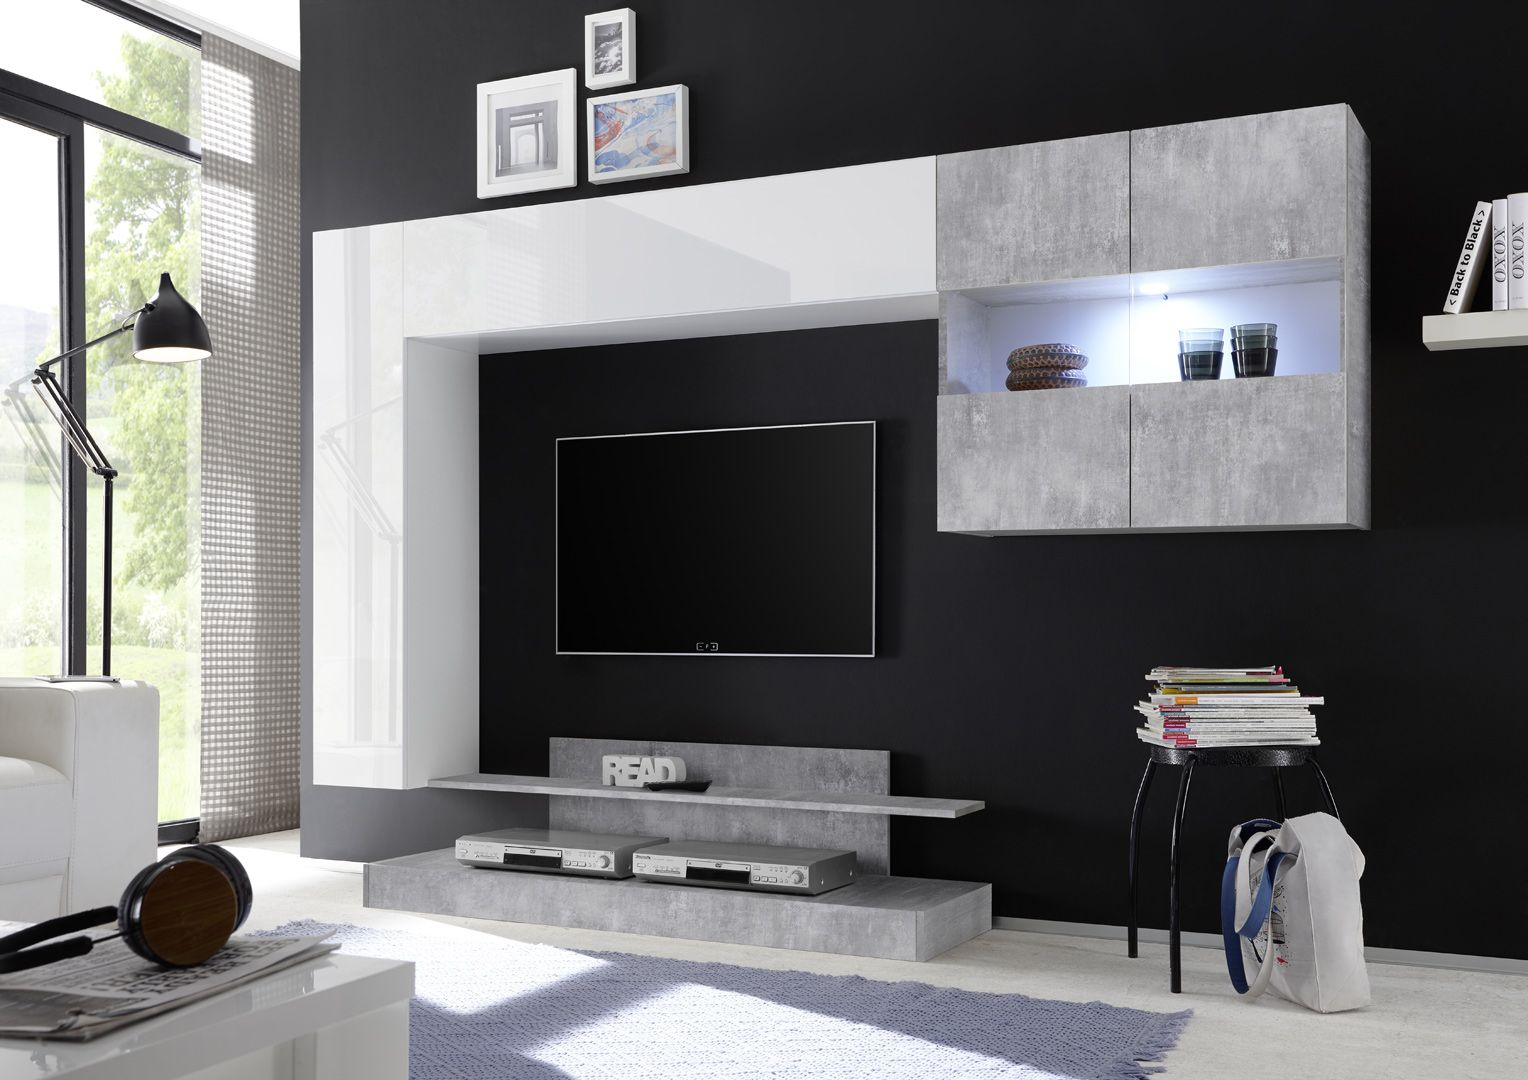 Ensemble Tv Mural Design Blanc Laque Beton Camargue Murale Design Parement Mural Et Tv Murale